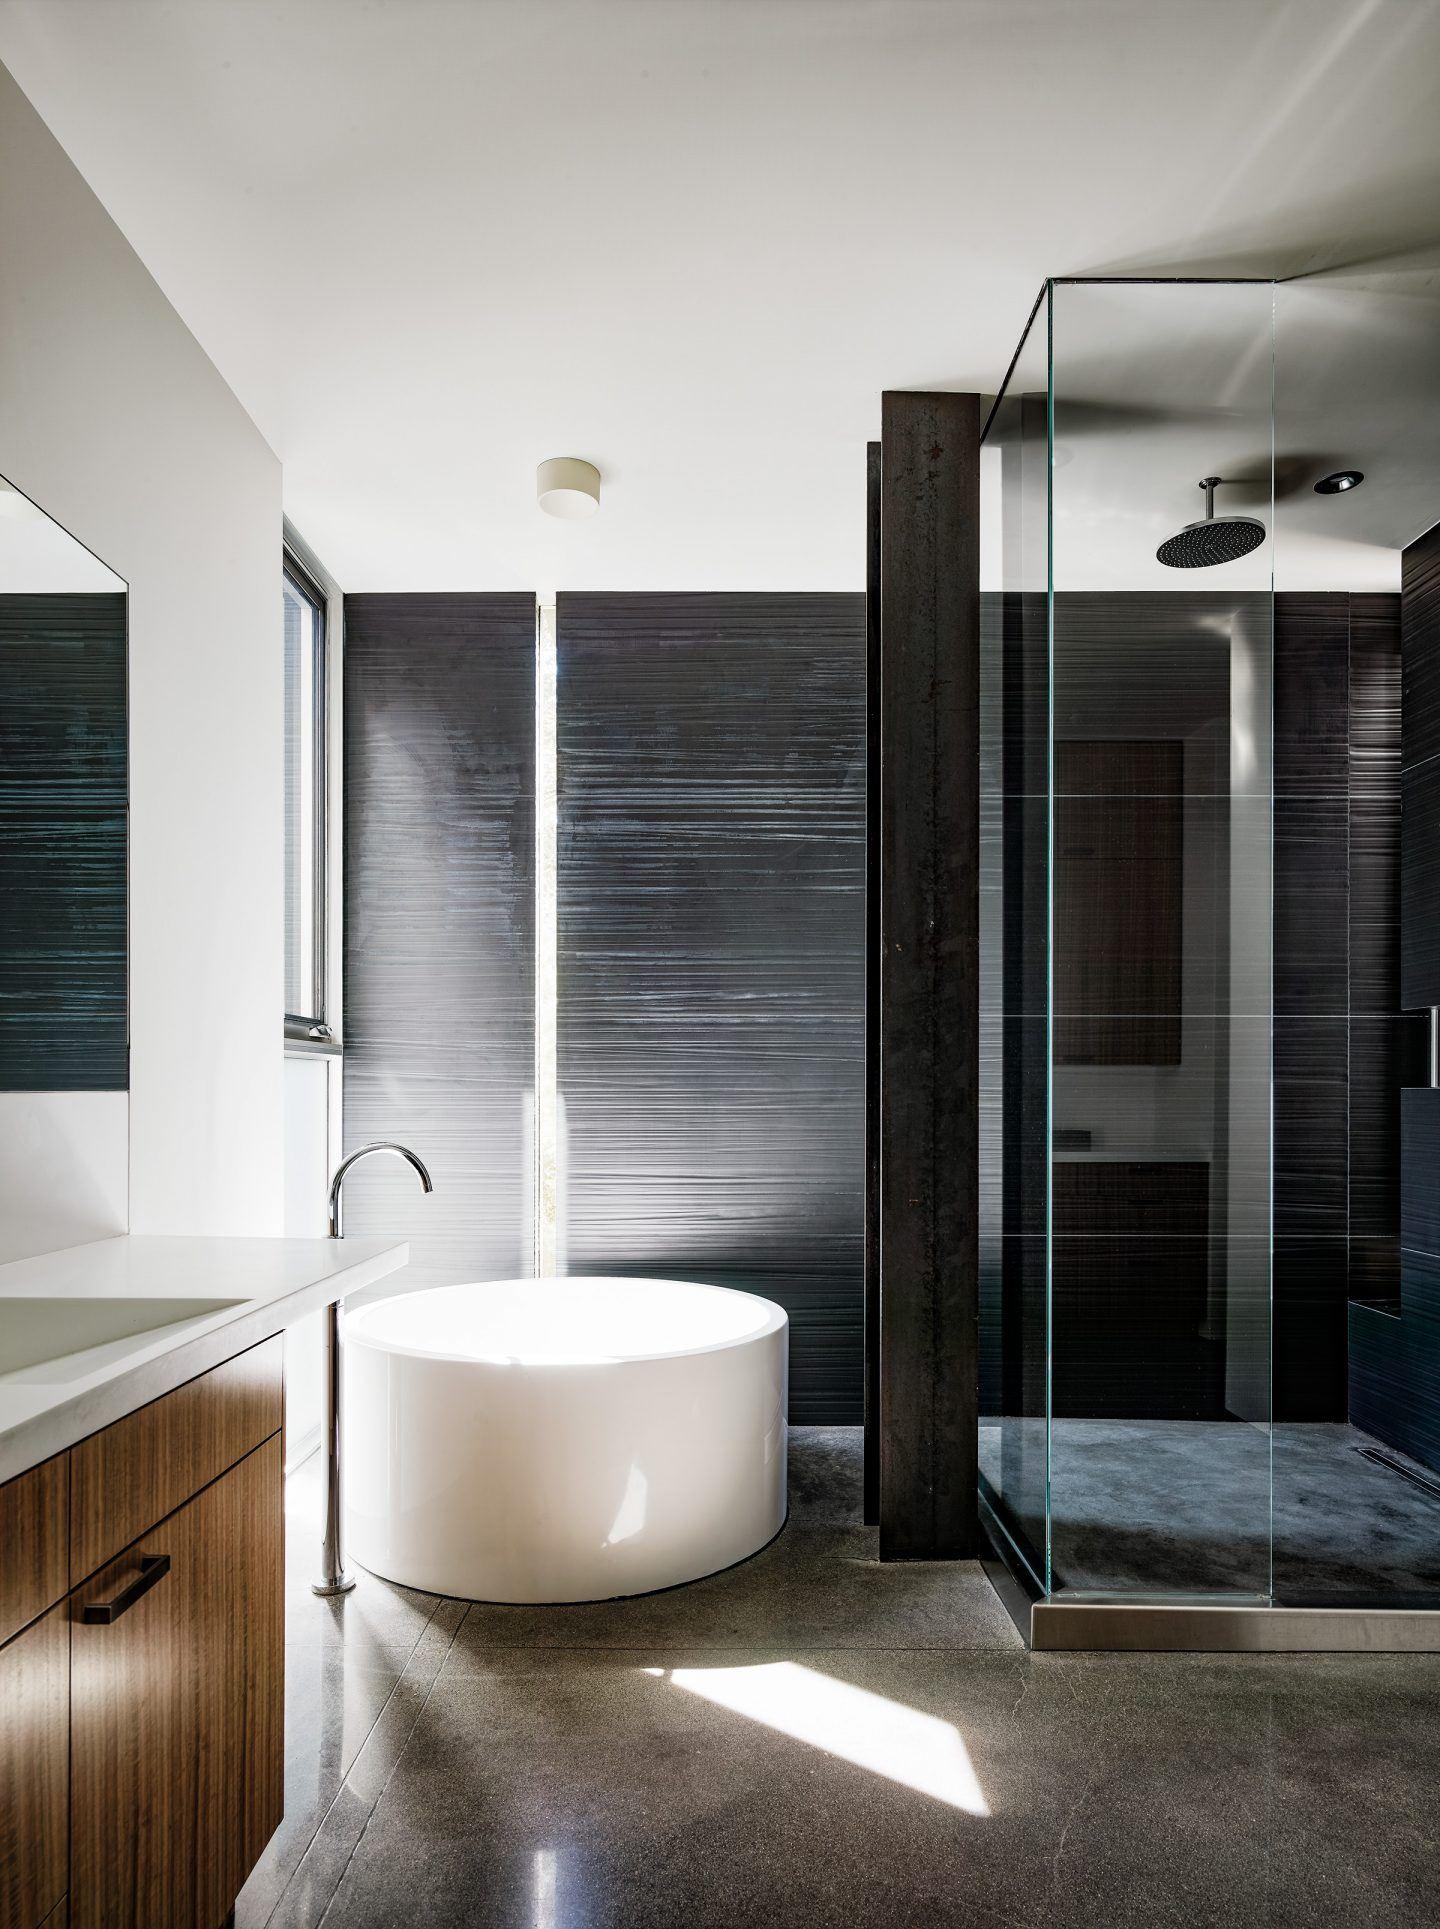 IGNANT-Architecture-Faulkner-Architects-Burnt-Cedar-08